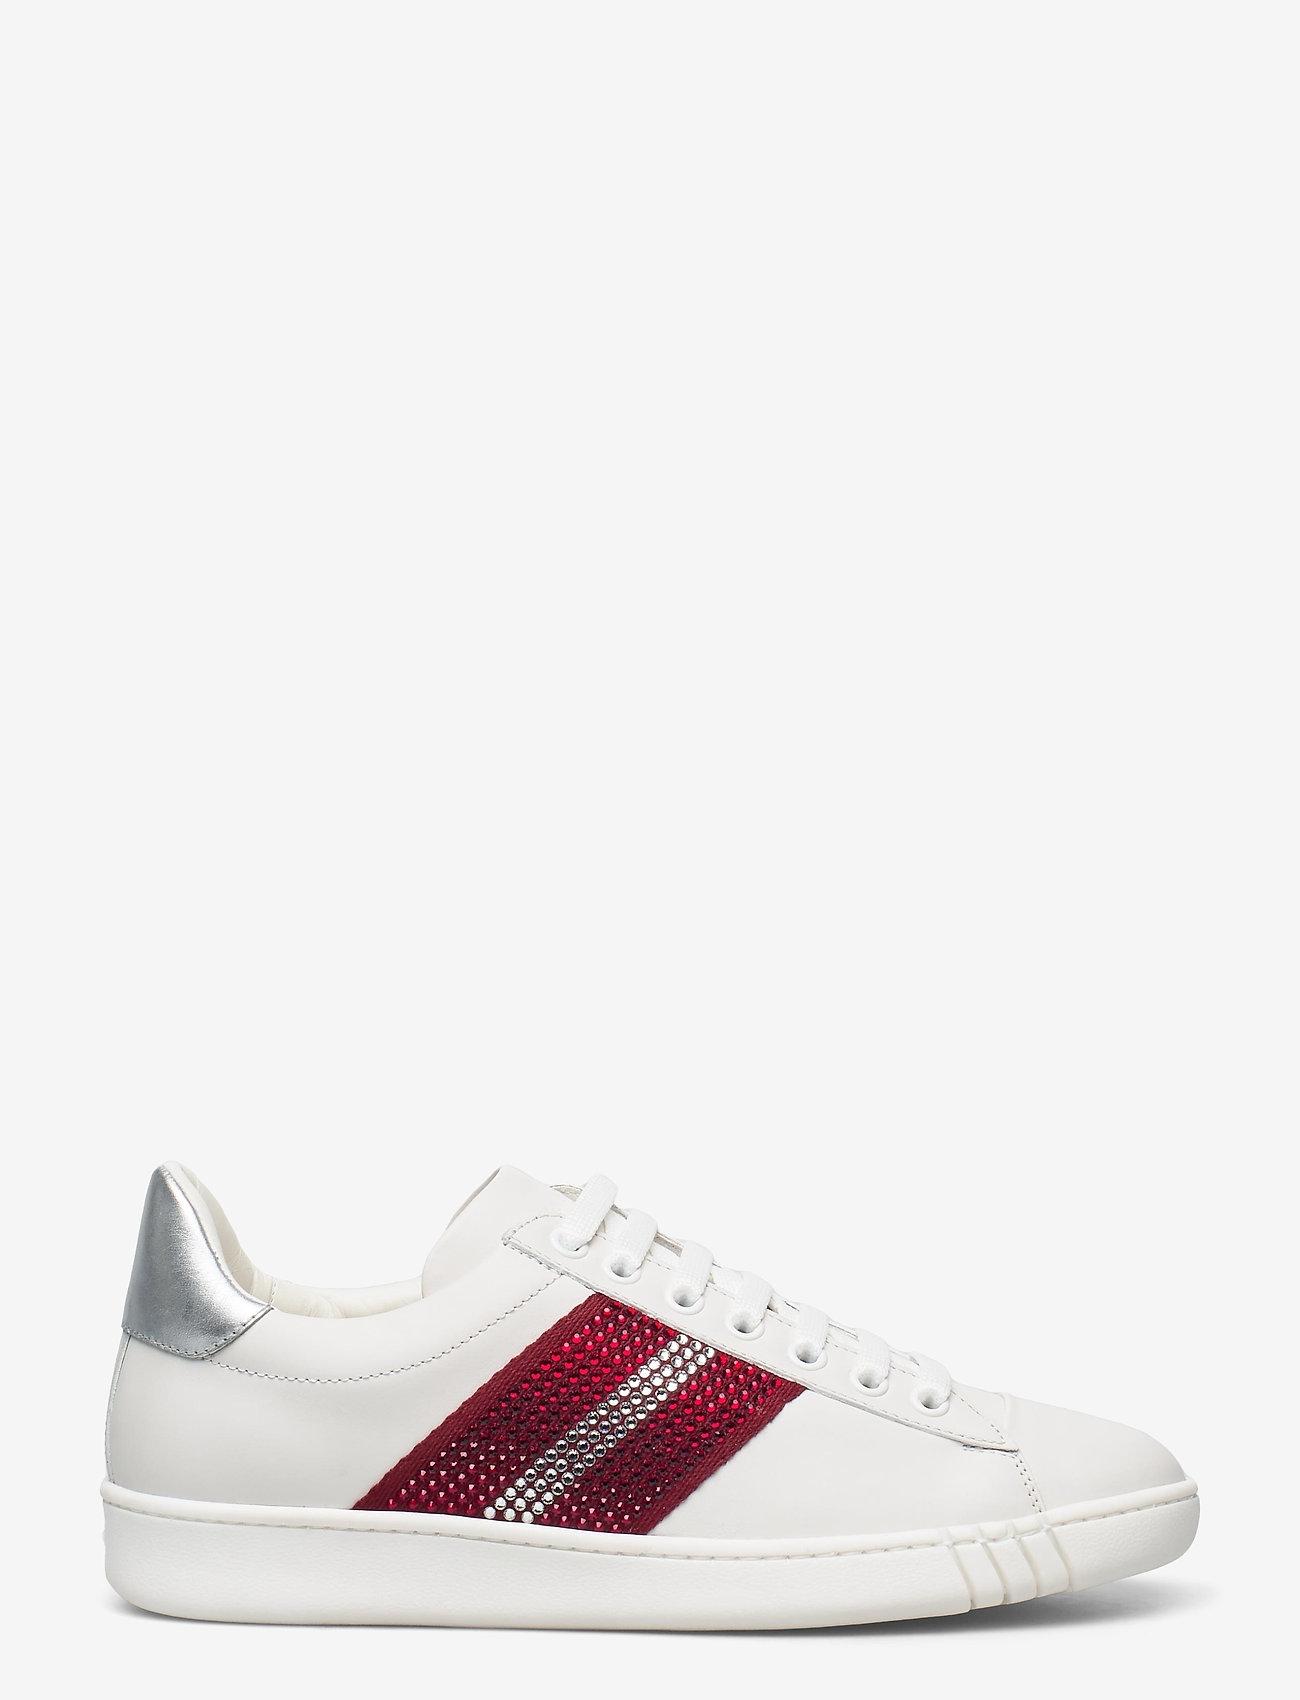 Bally - WIERA-TSP/08 - lage sneakers - white/tsp bally - 1